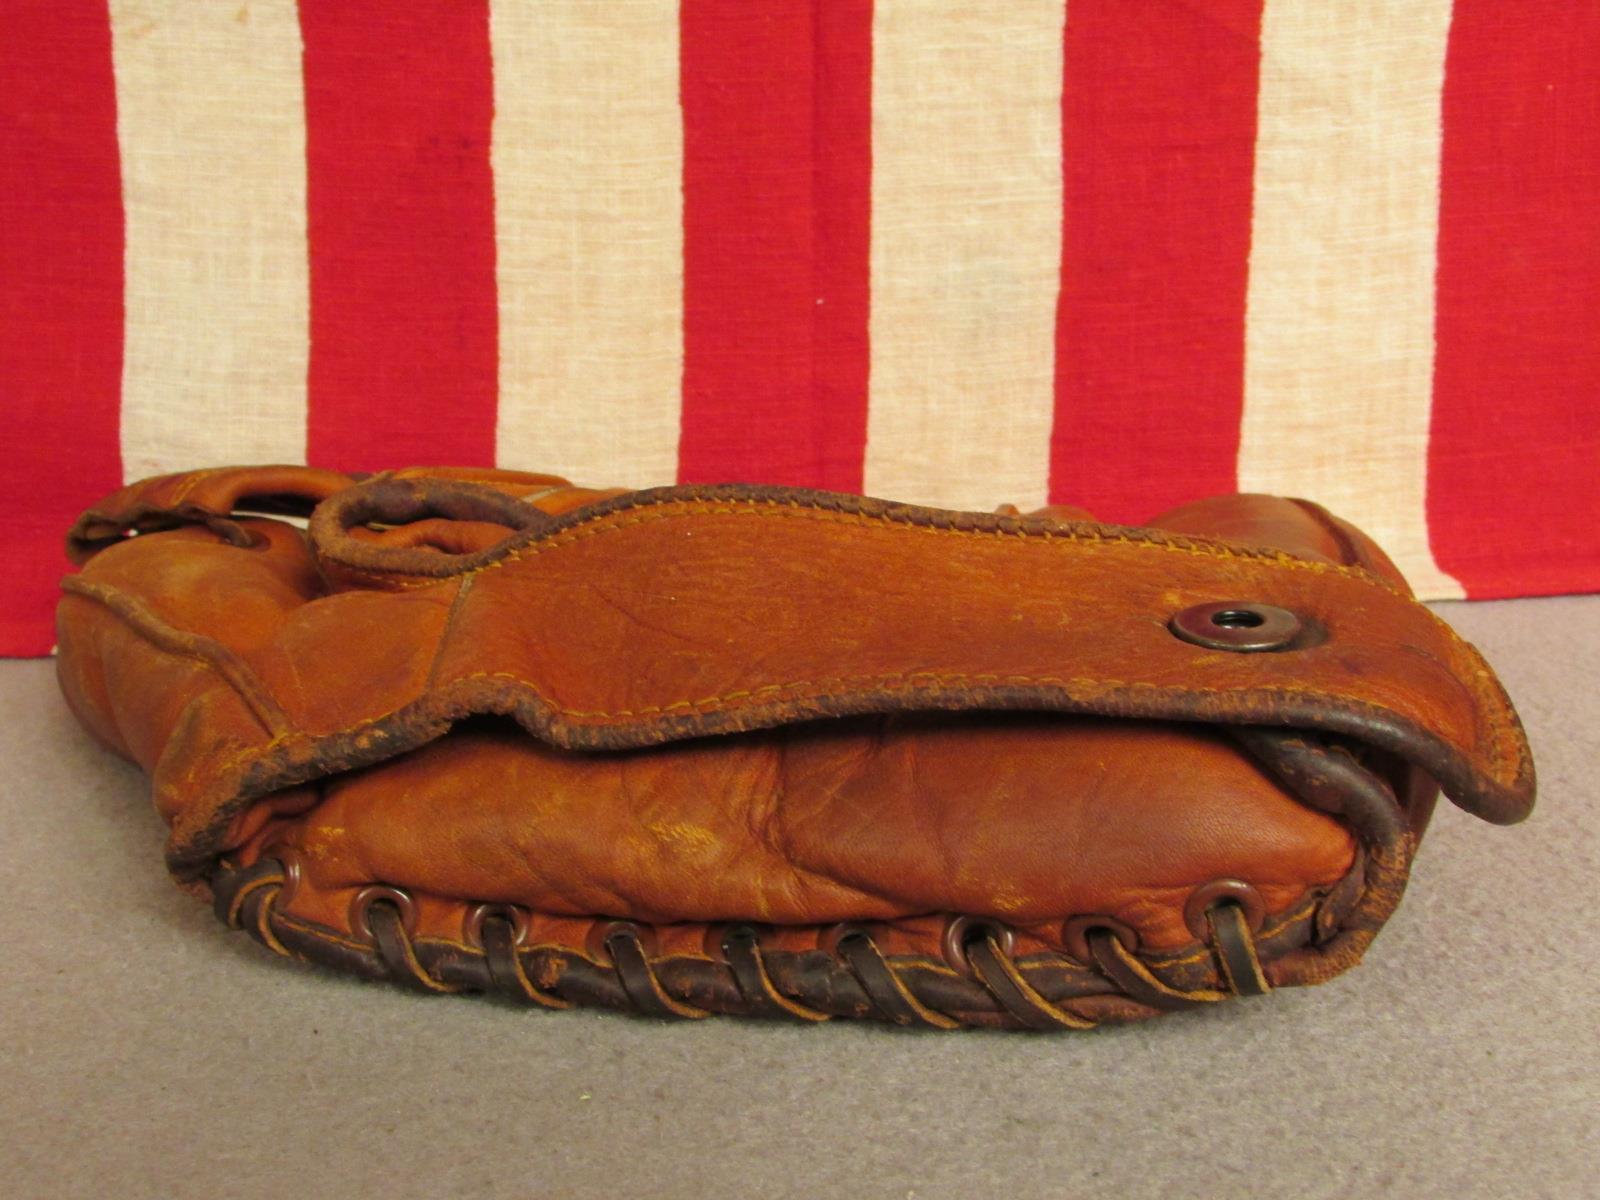 Vintage 1940s Jahre Tru Stanky Test Leder Baseball Handschuh Eddie Stanky Tru Modell Lefty b6d09f